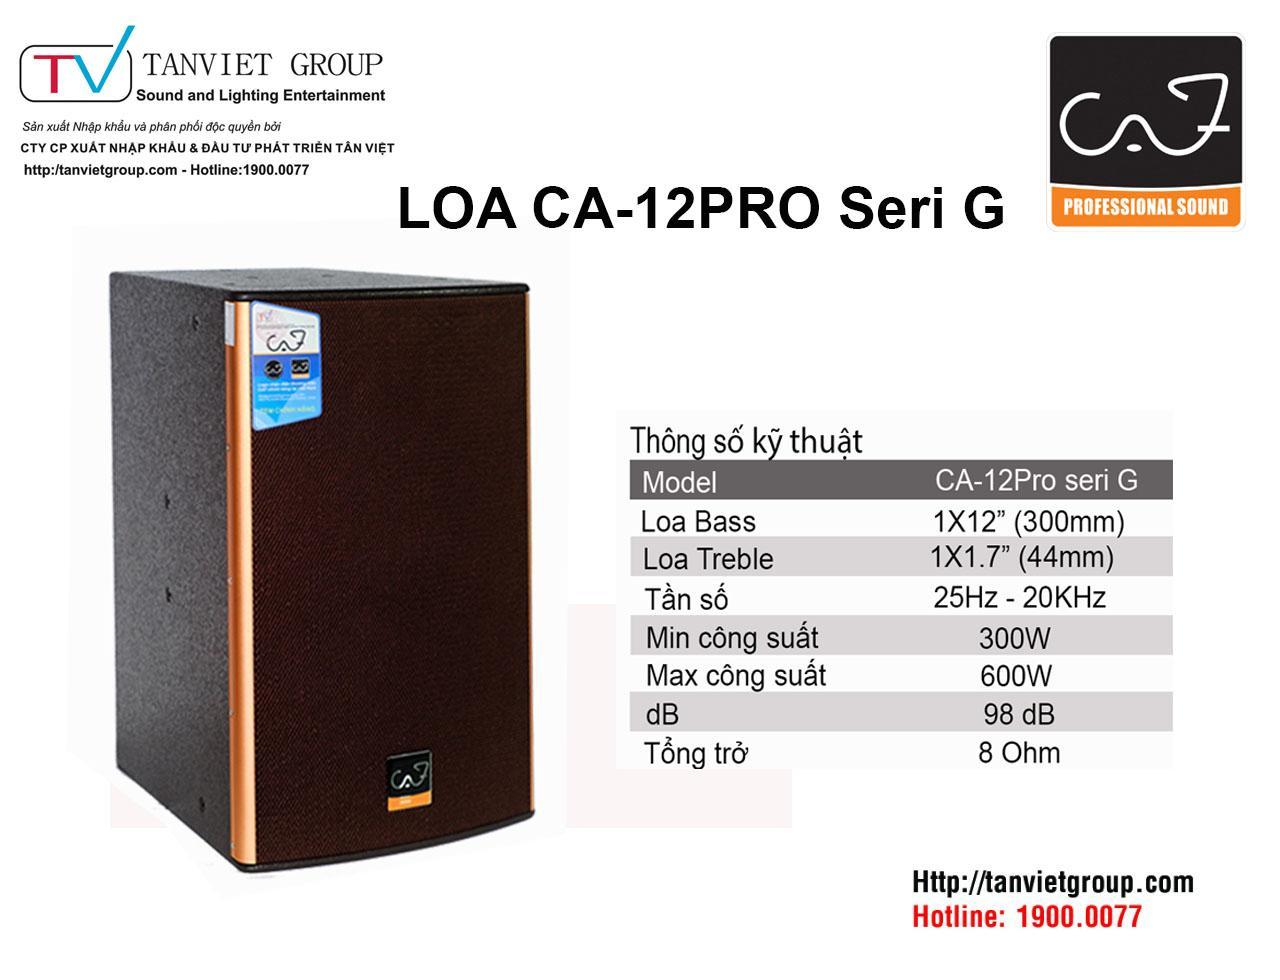 LOA CA-12PRO SERI G